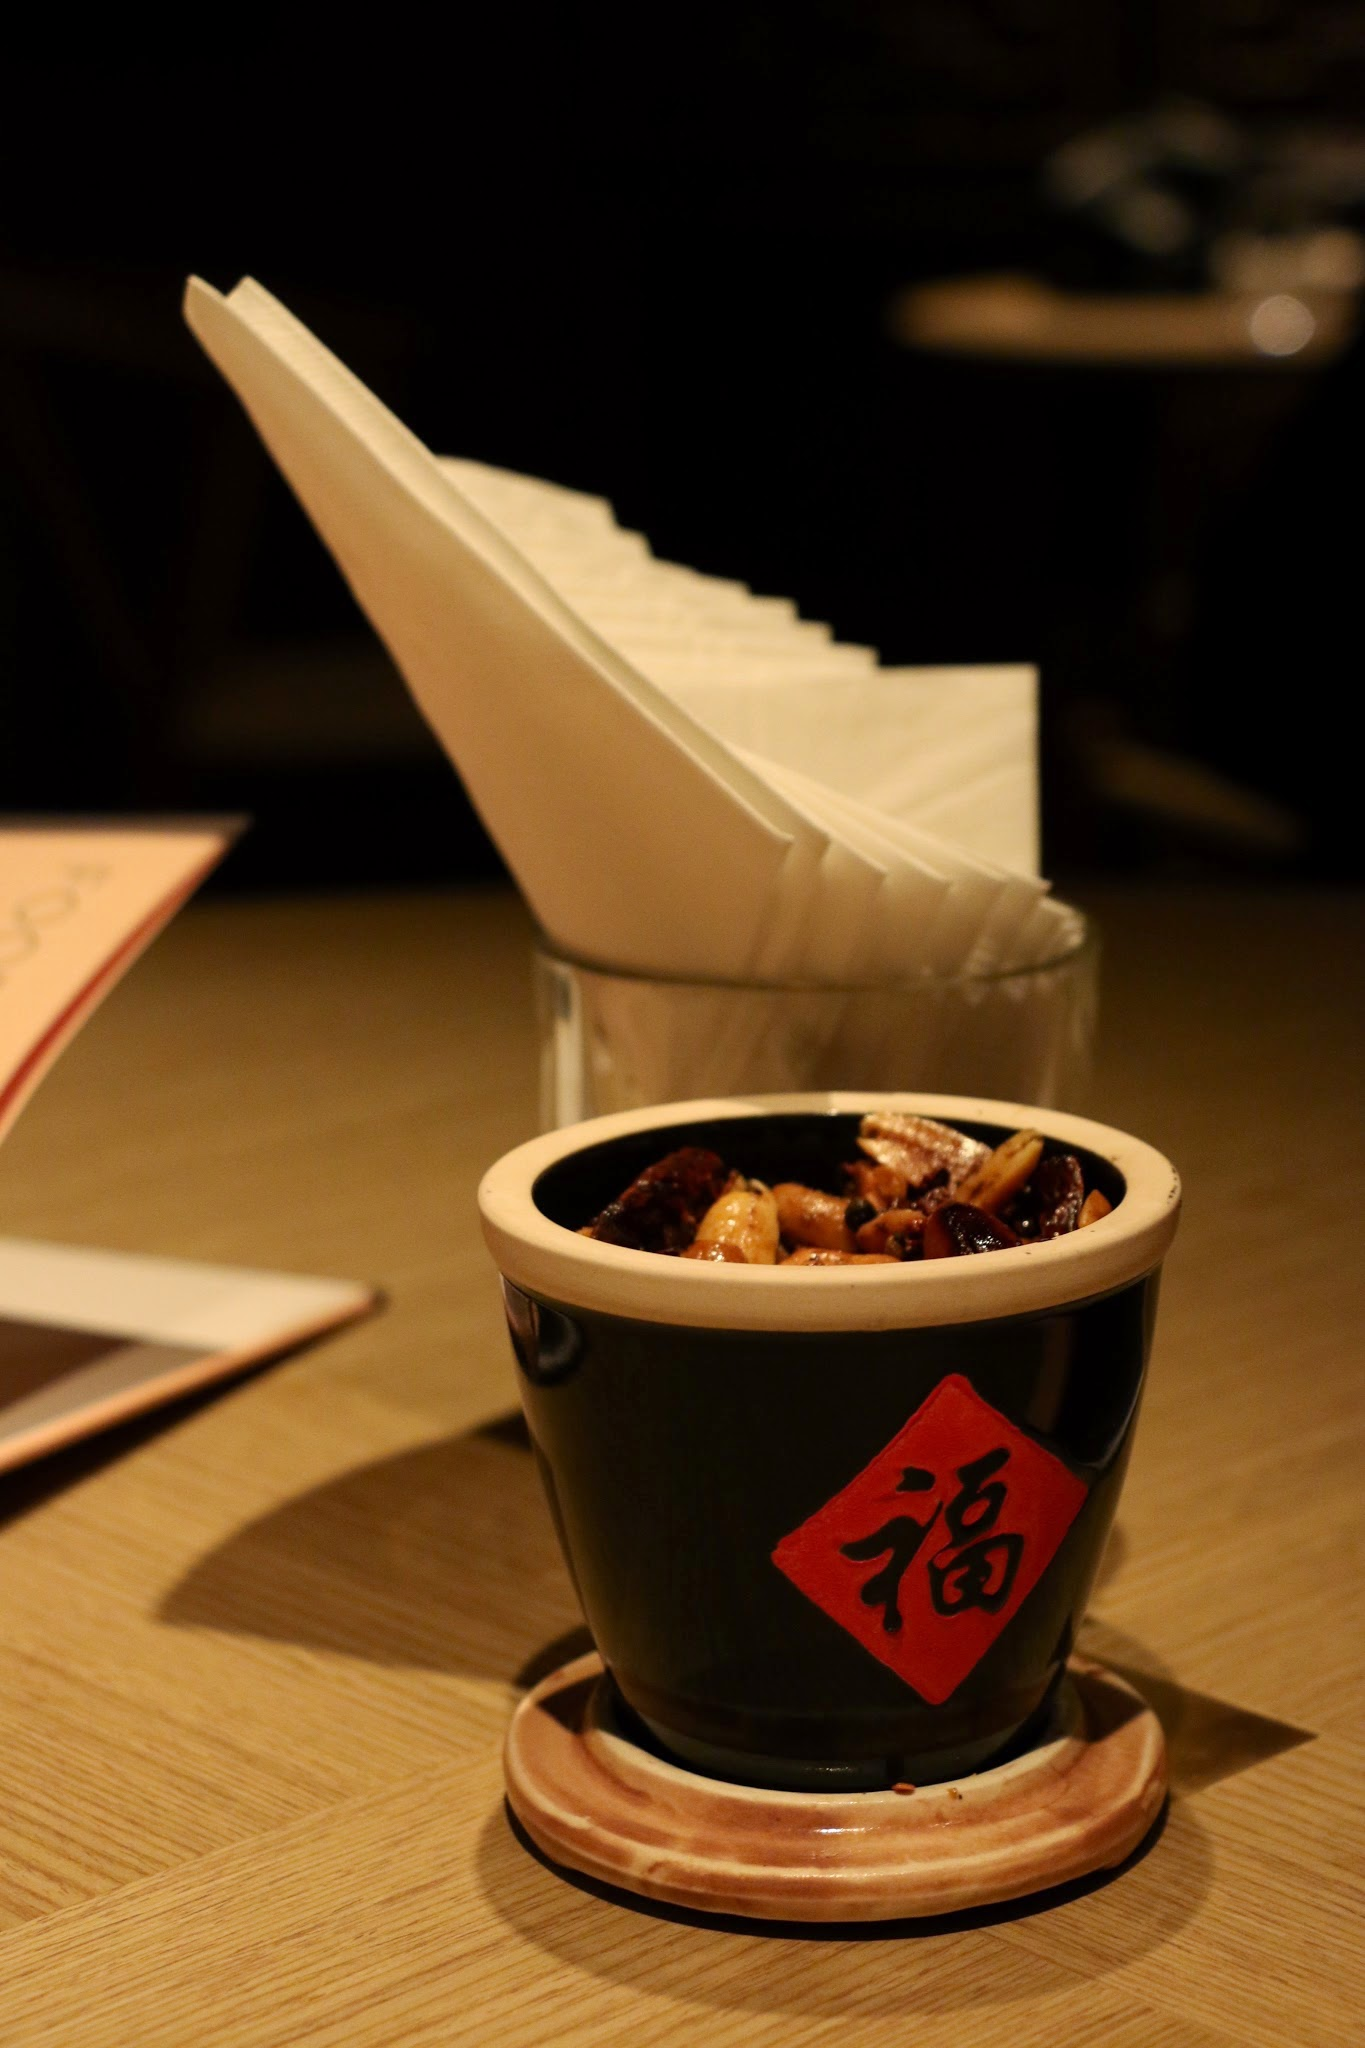 Bao Bei, Sichuan Pepper Peanut